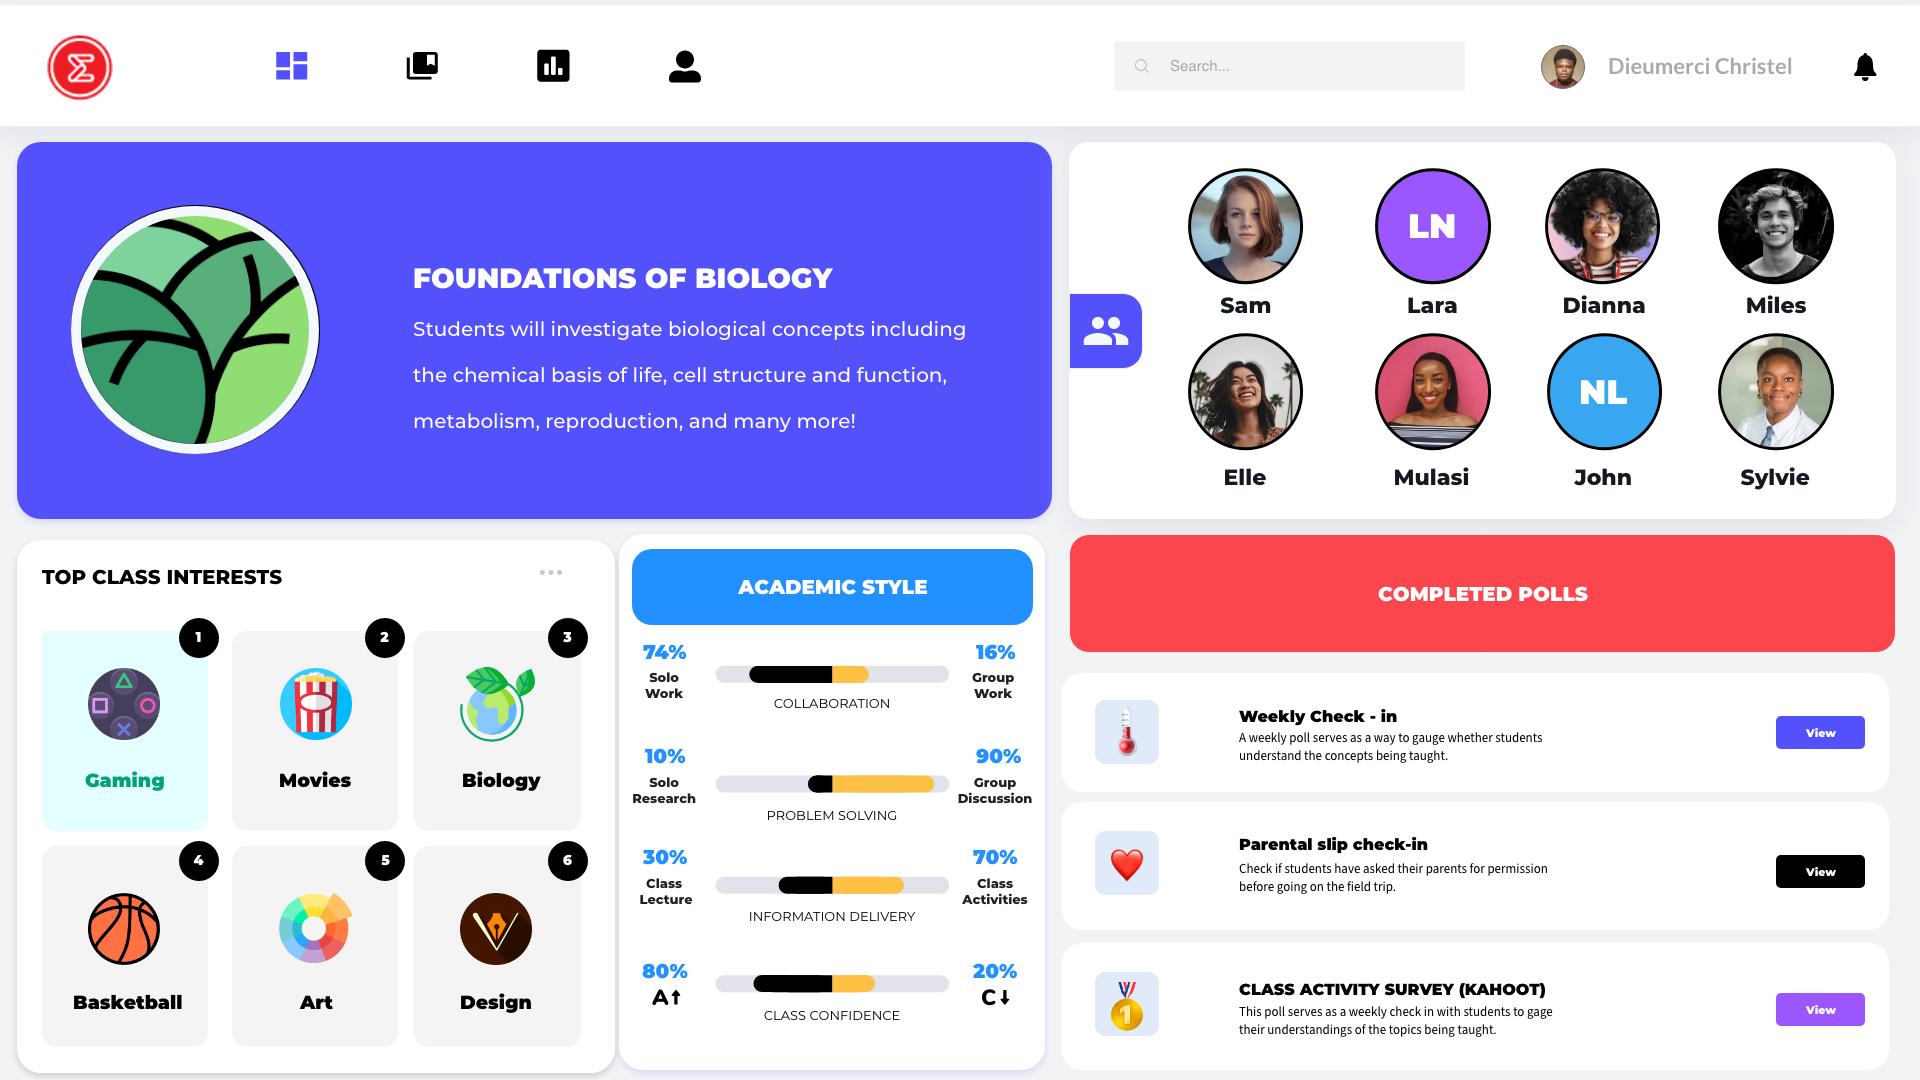 A screenshot of the class profile